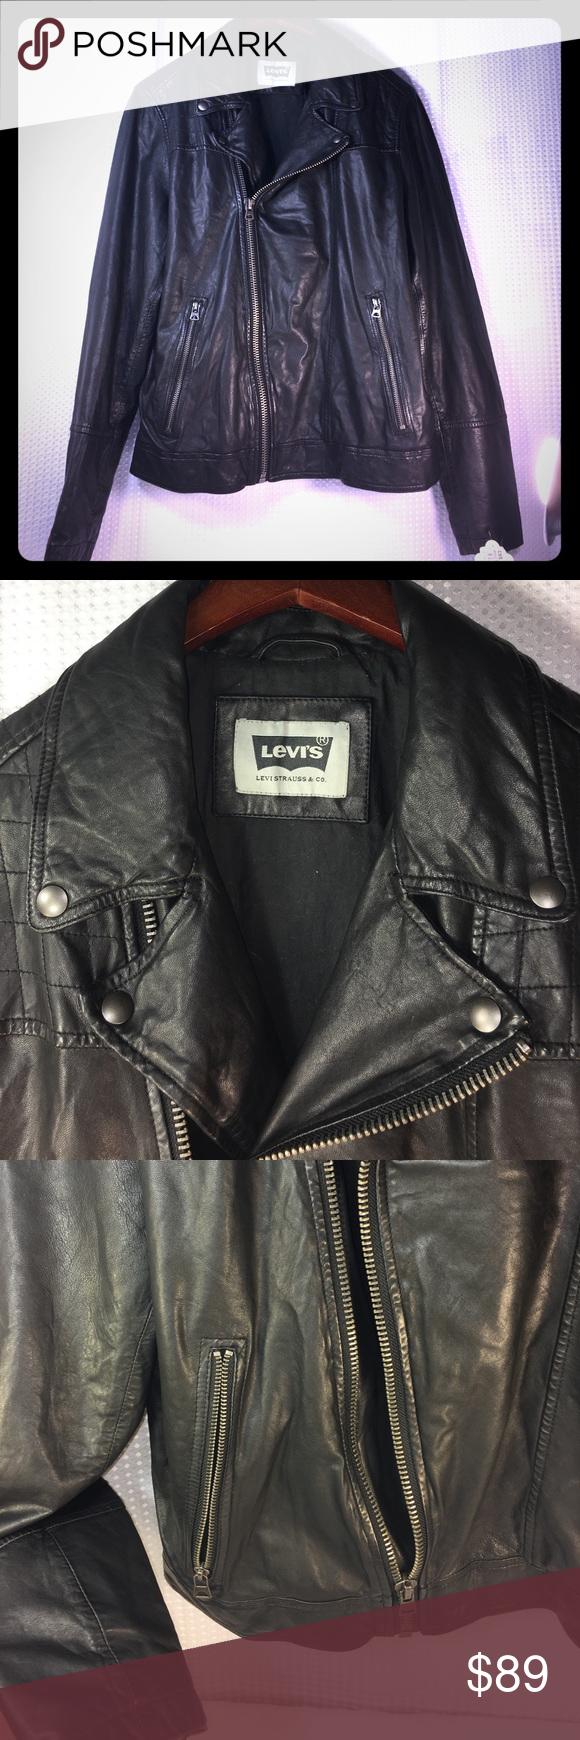 Levi's Strauss rugged leather motorcycle jacket Levi